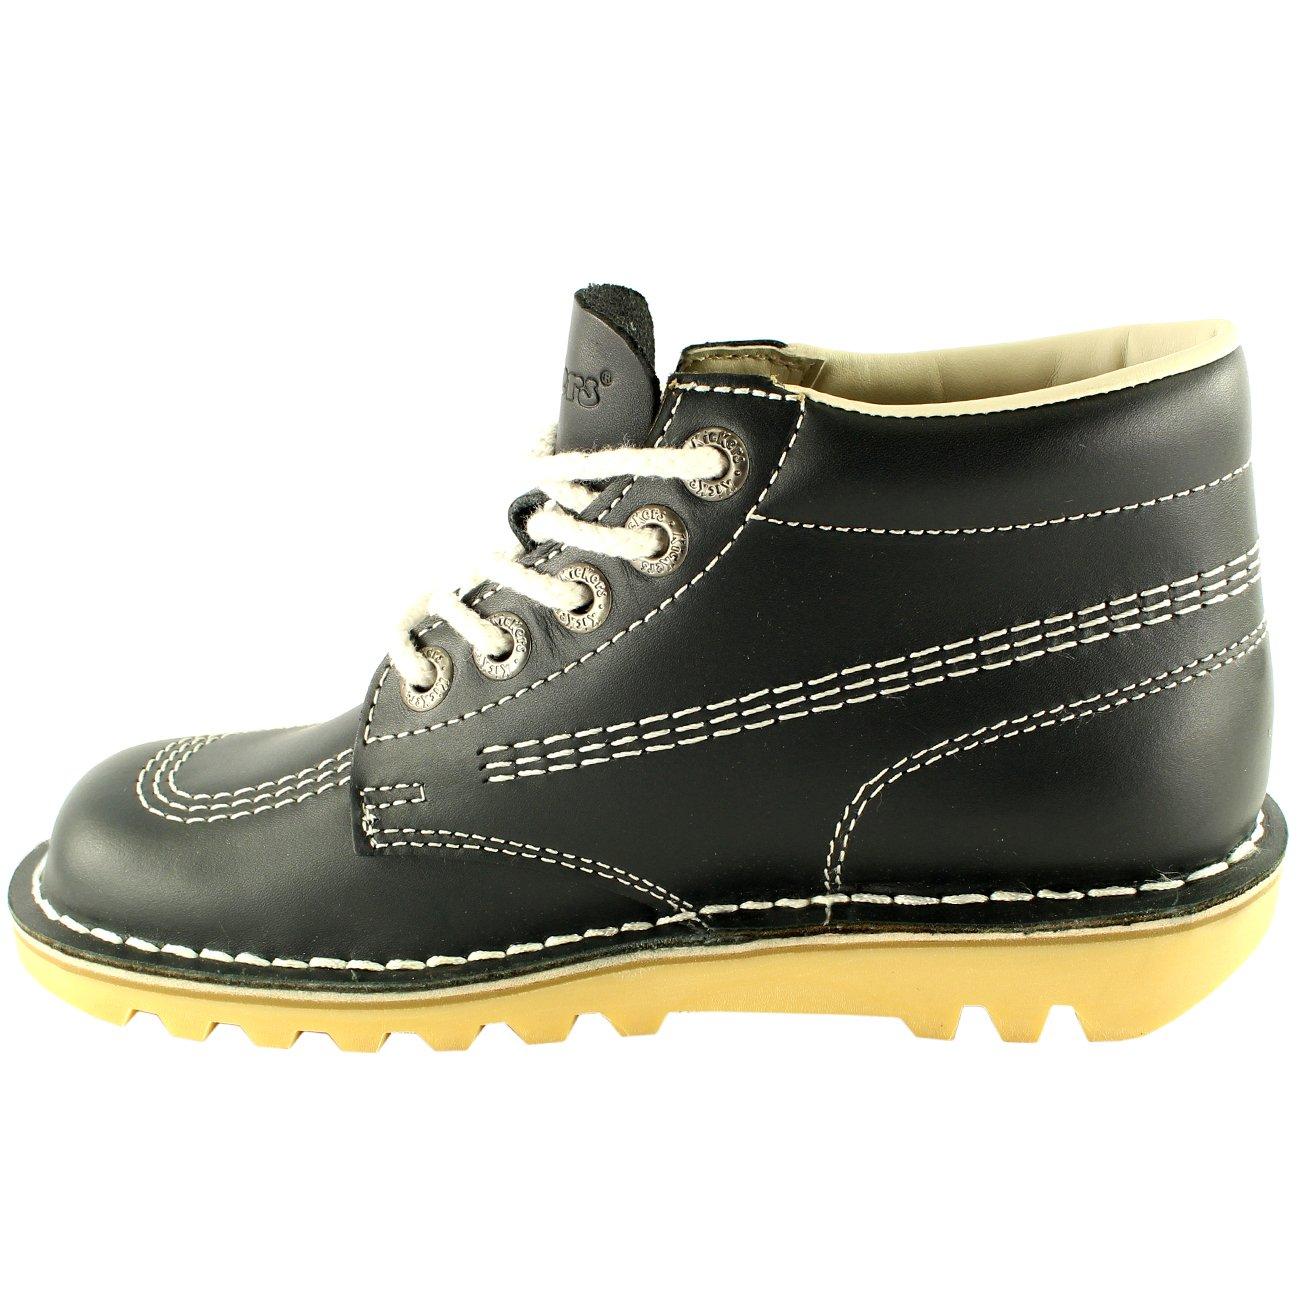 Unisex Kids Junior Kickers Kick Hi Back to School Leather Boot Shoes